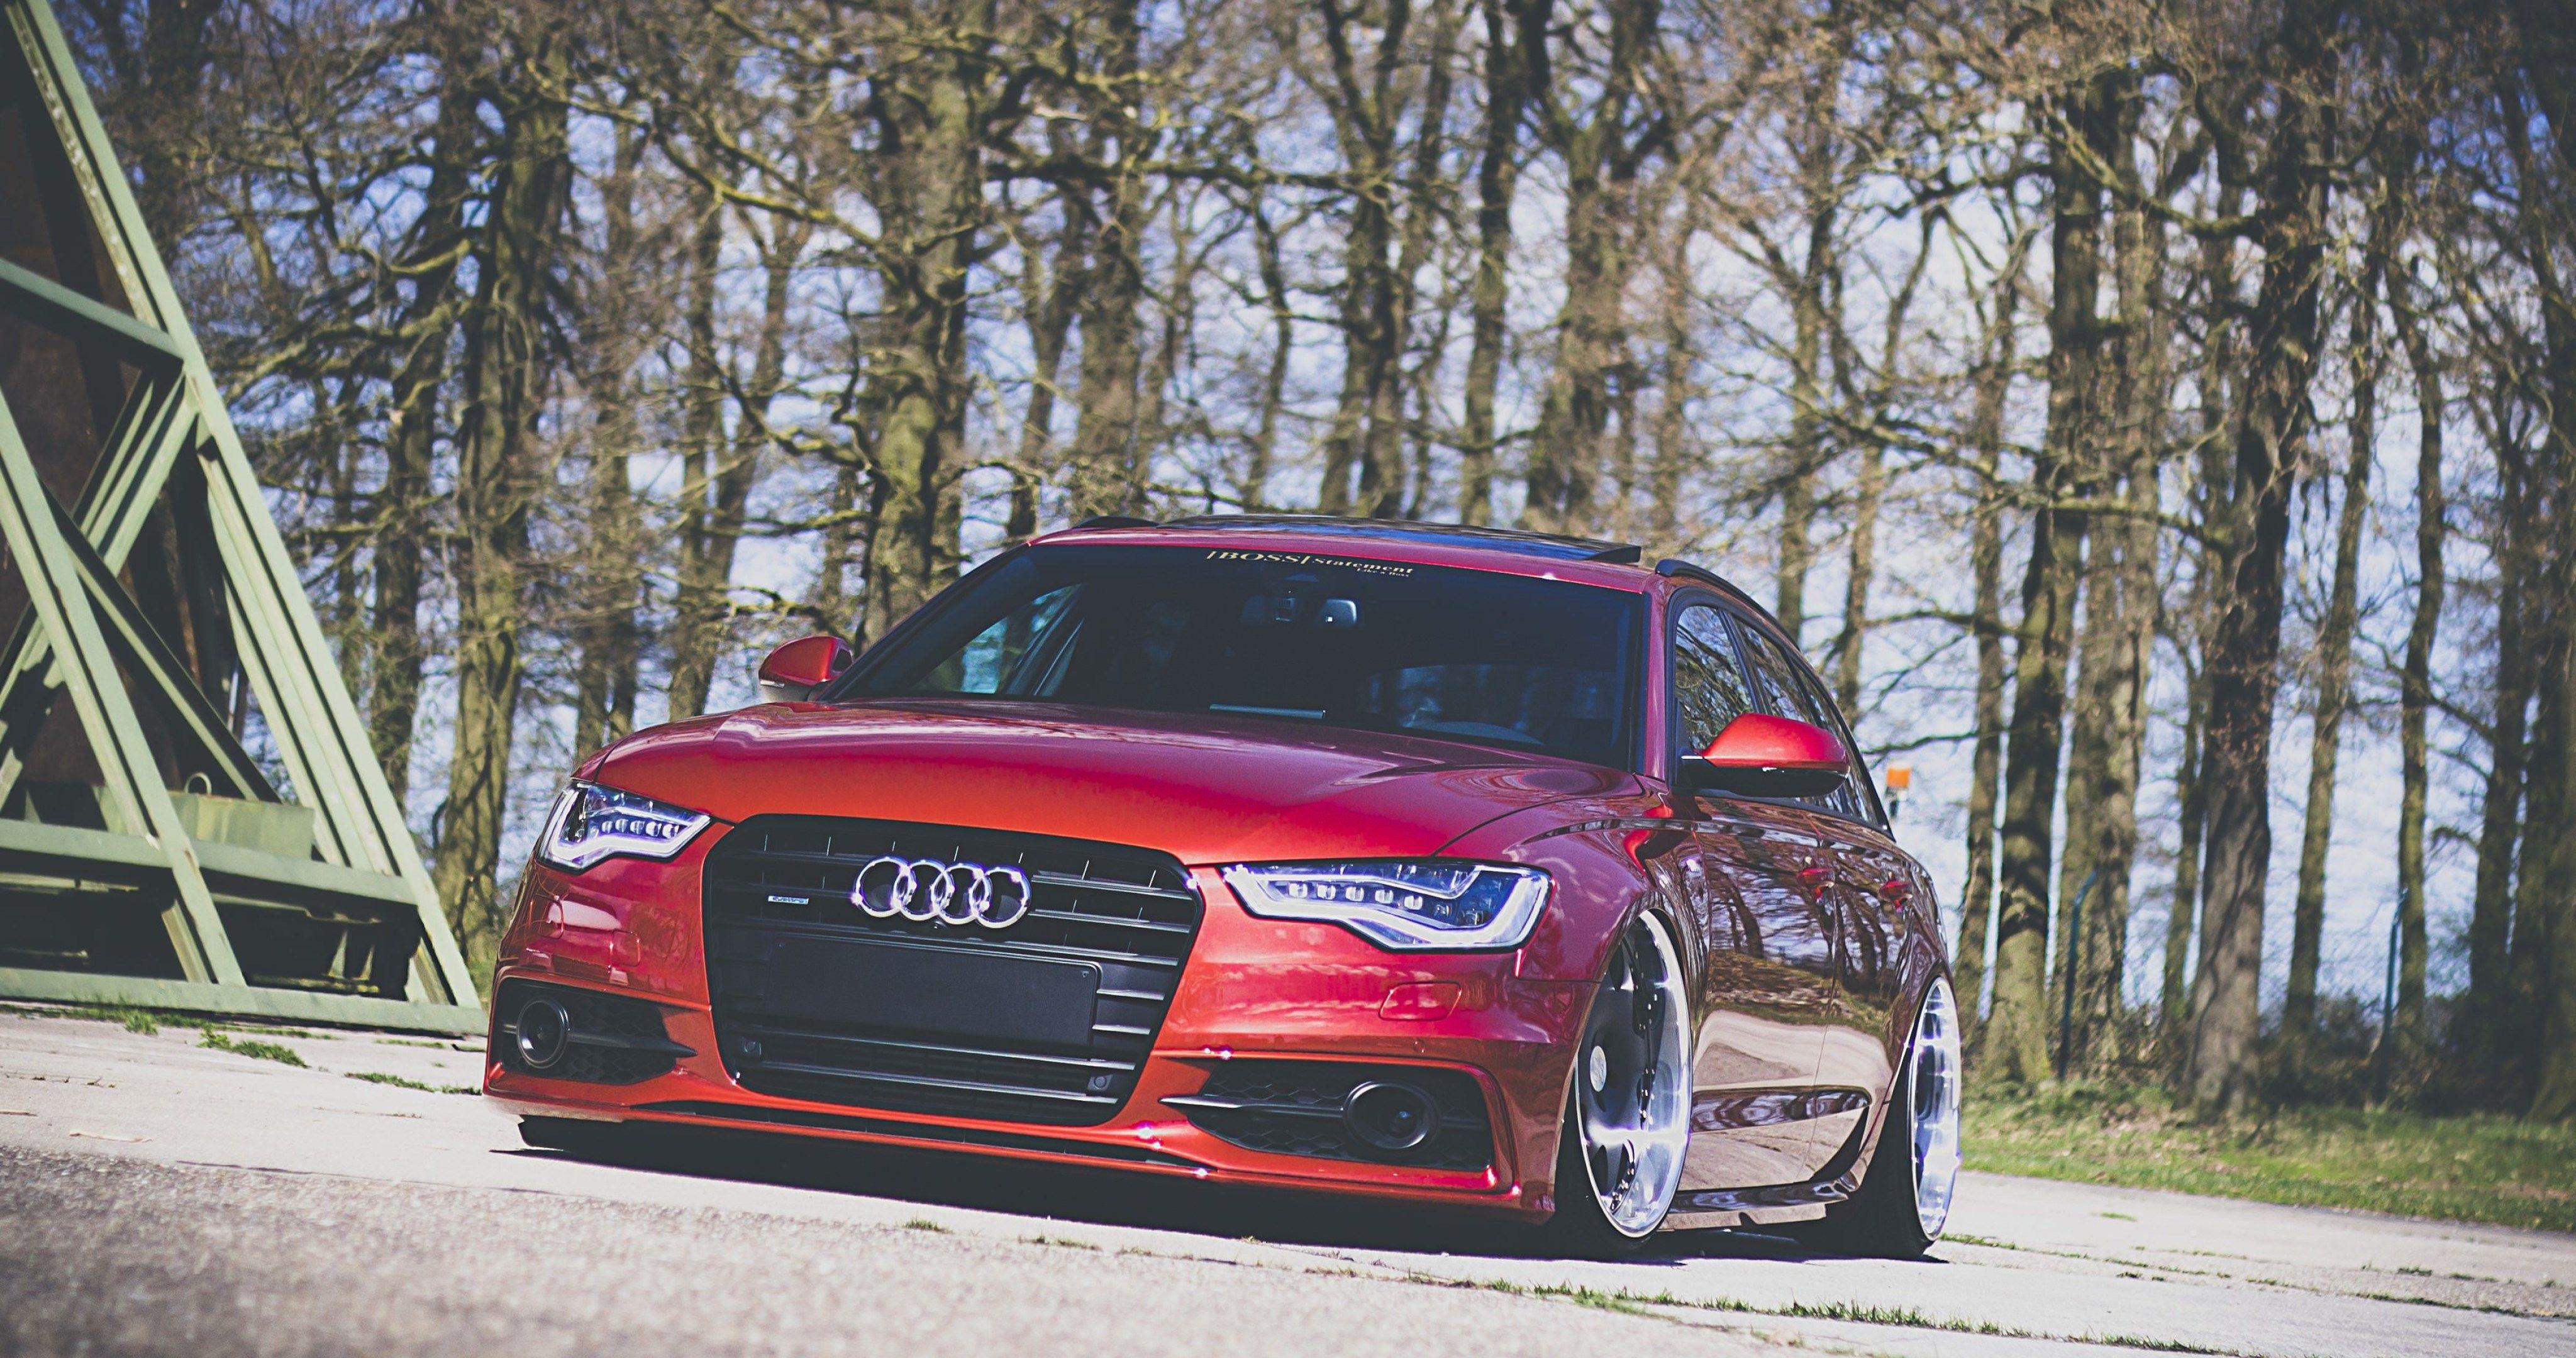 Audi A6 Avant Wallpaper 4k Ultra Hd Wallpaper Audi A6